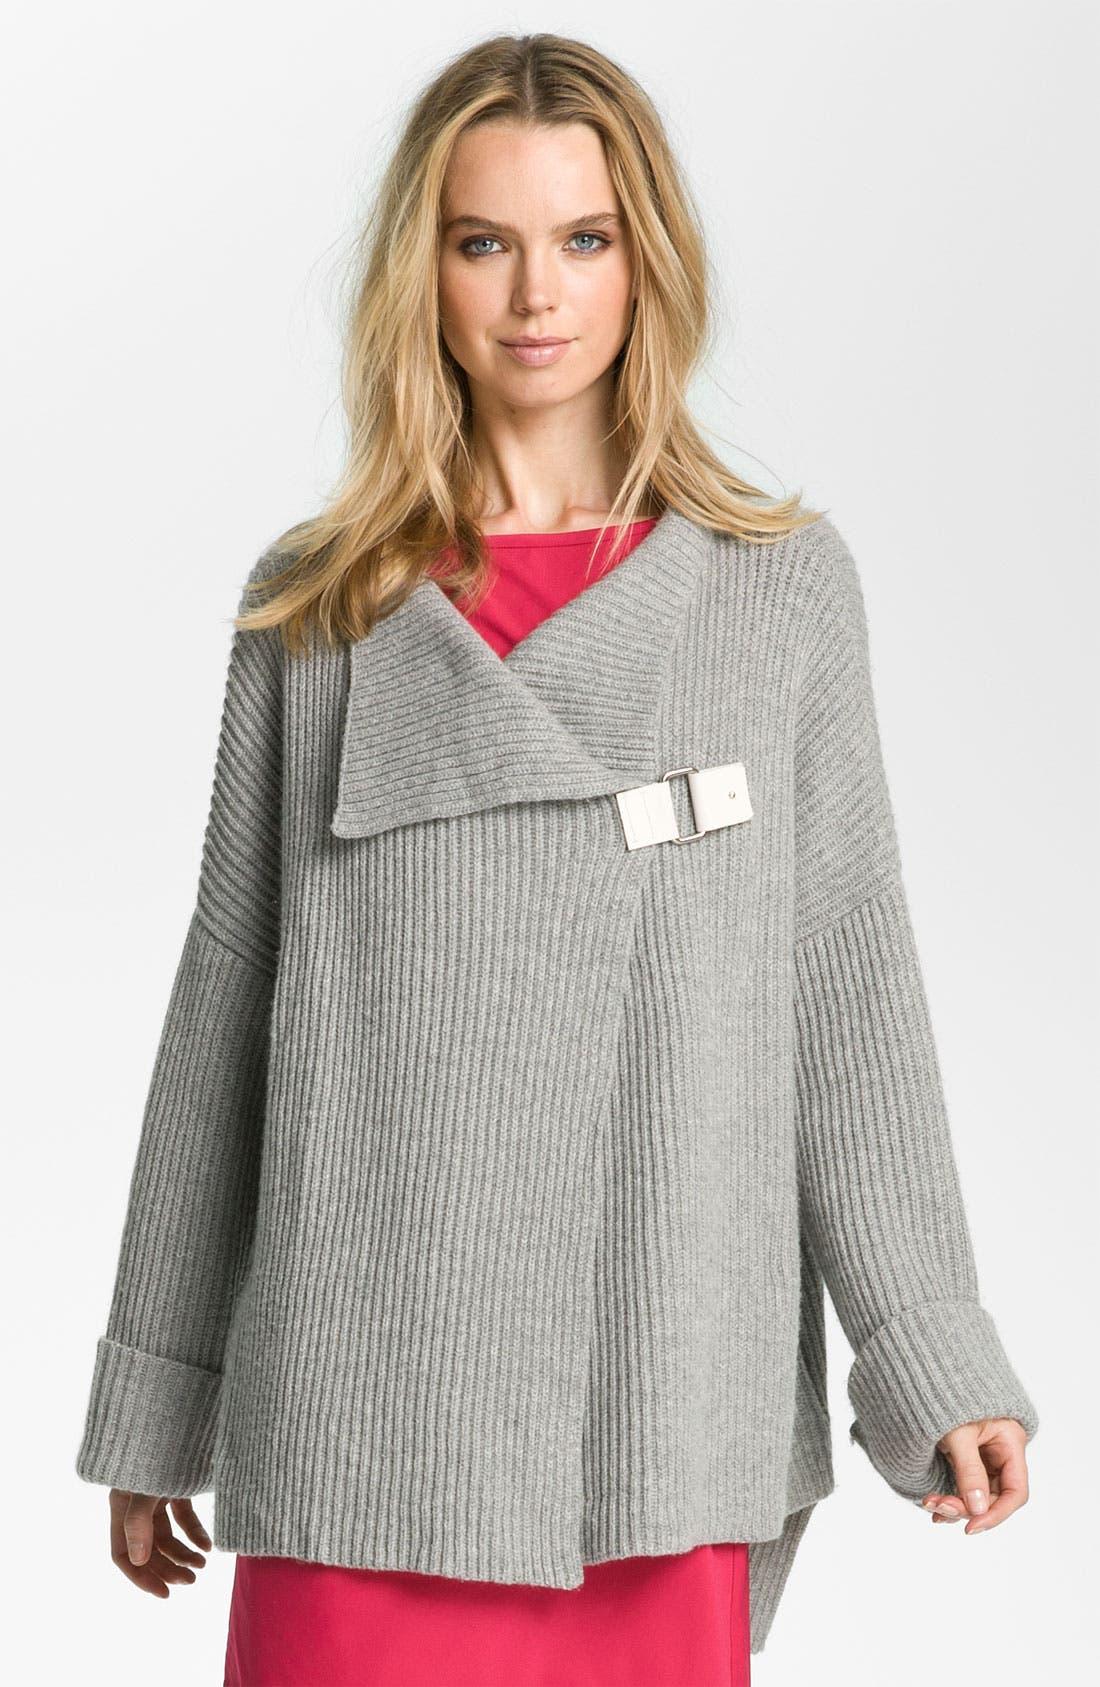 Main Image - Diane von Furstenberg 'Brooke' Wool Sweater